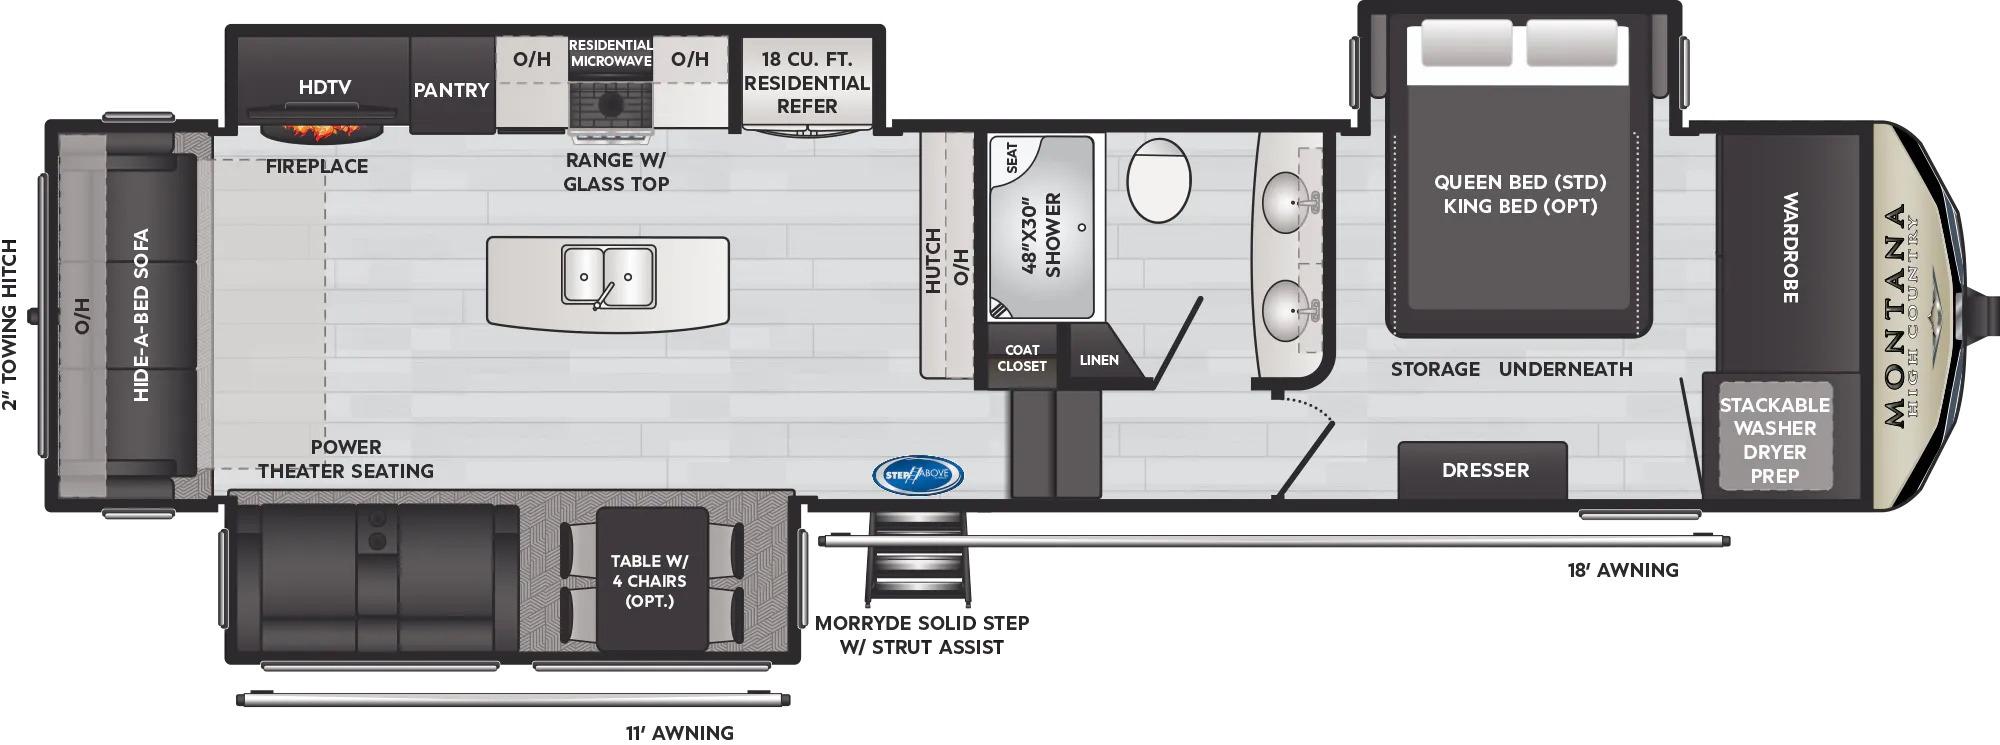 View Floor Plan for 2022 KEYSTONE MONTANA HIGH COUNTRY 331RL